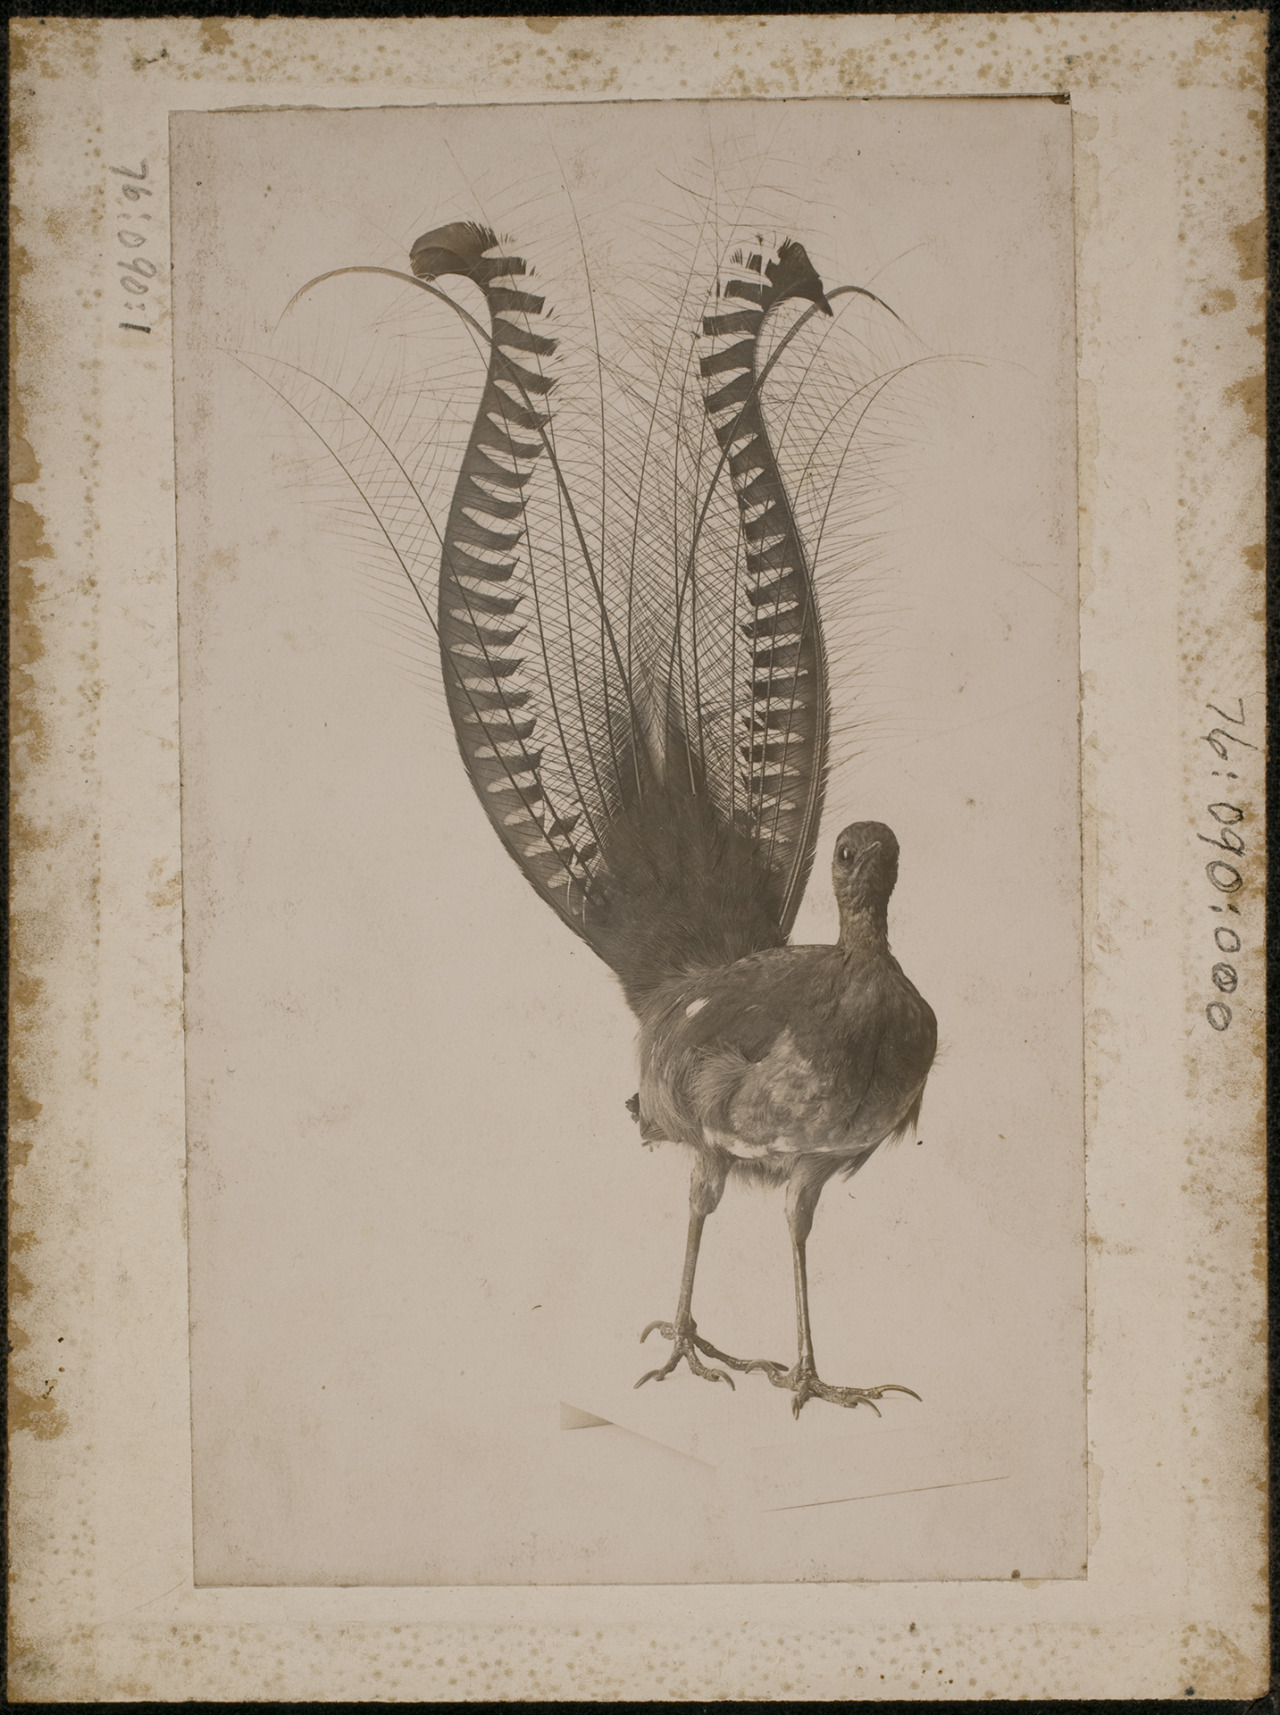 Luis Soler Pujol 1910, Fotografía de Eastman Museum